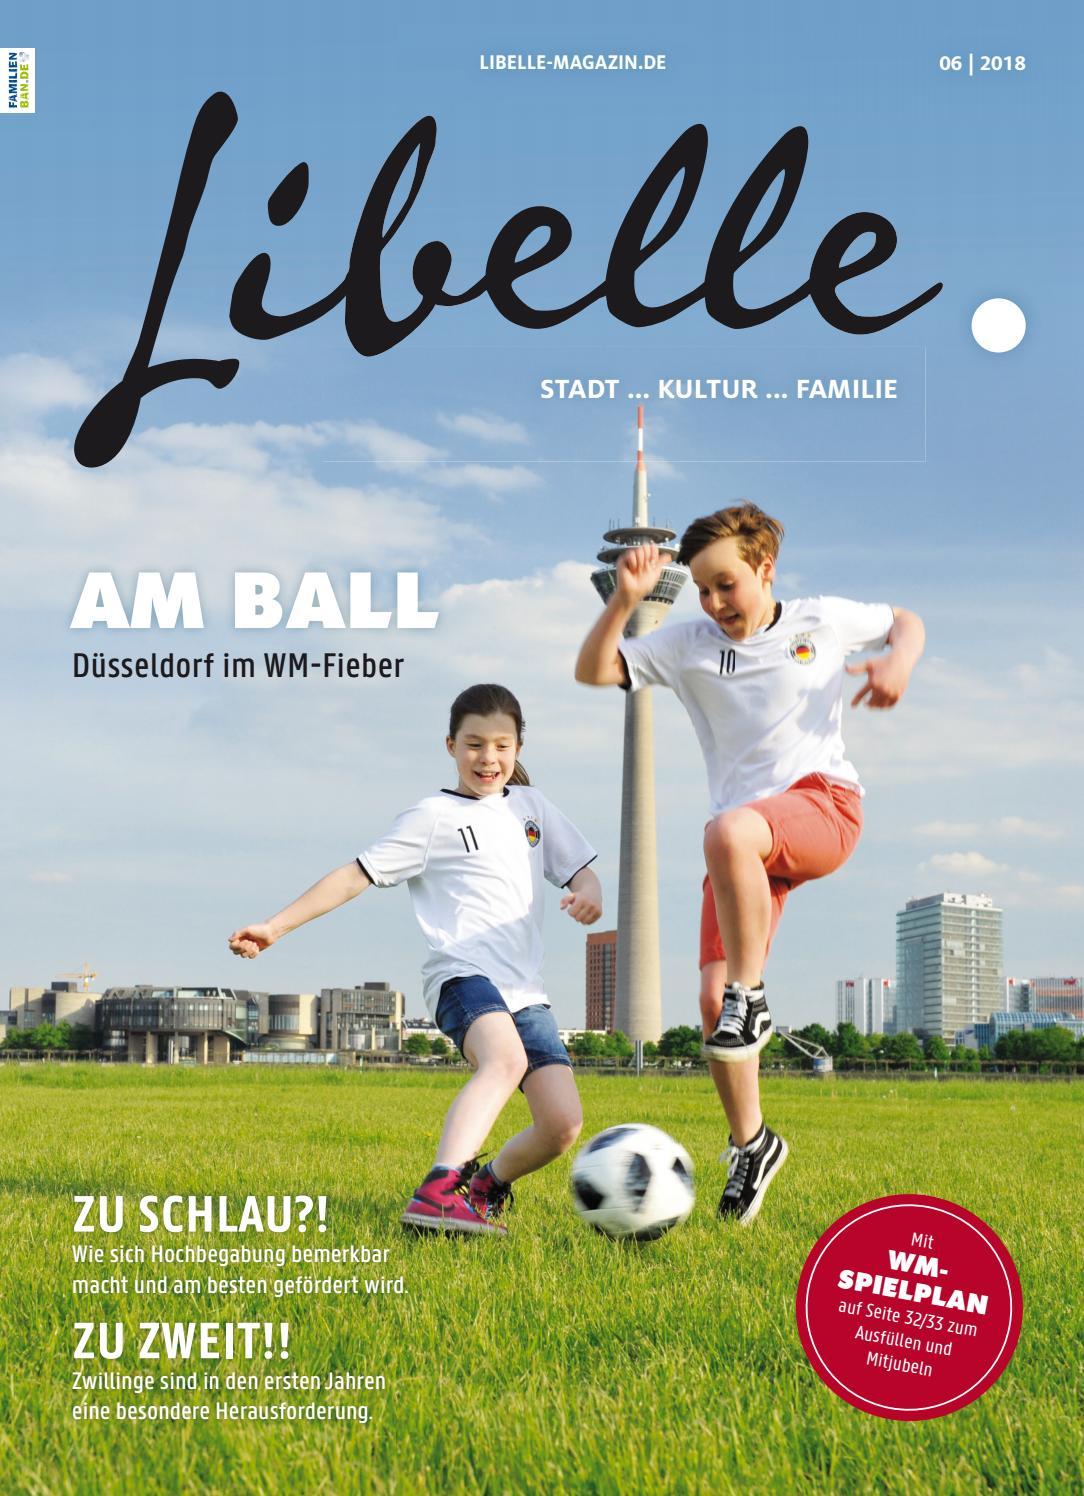 Libelle Juni 2018 by Libelle   Stadt ... Kultur ... Familie - issuu